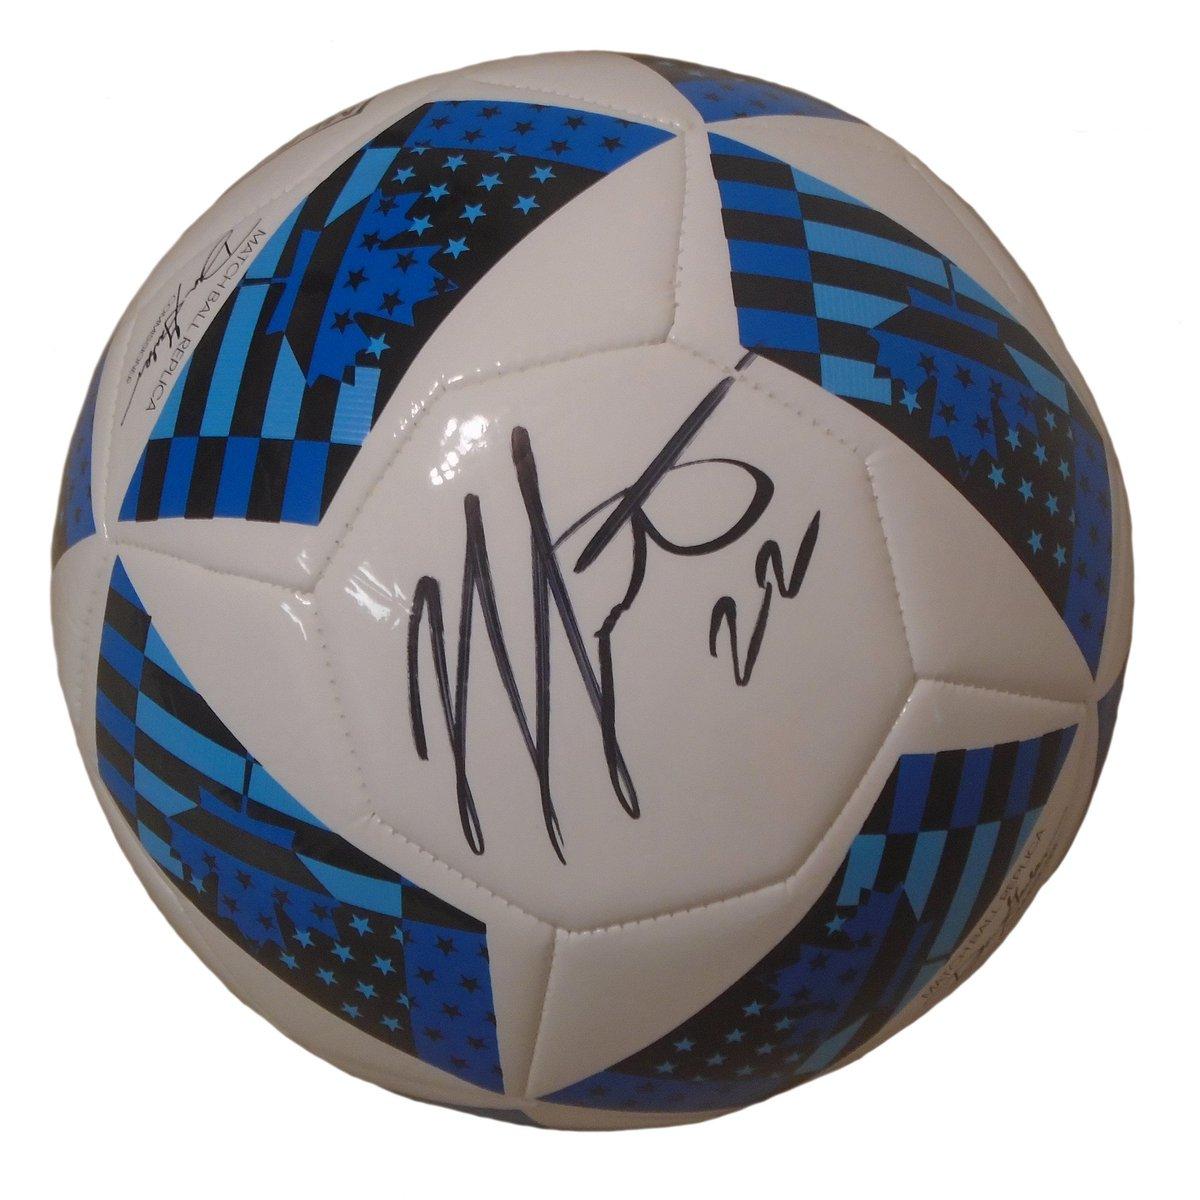 Jordan Hamilton Autographed MLS Adidas White Soccer Ball, Proof Photo USD 119.99 https://t.co/HmGdpvbfdv https://t.co/YrO2RY9sLc